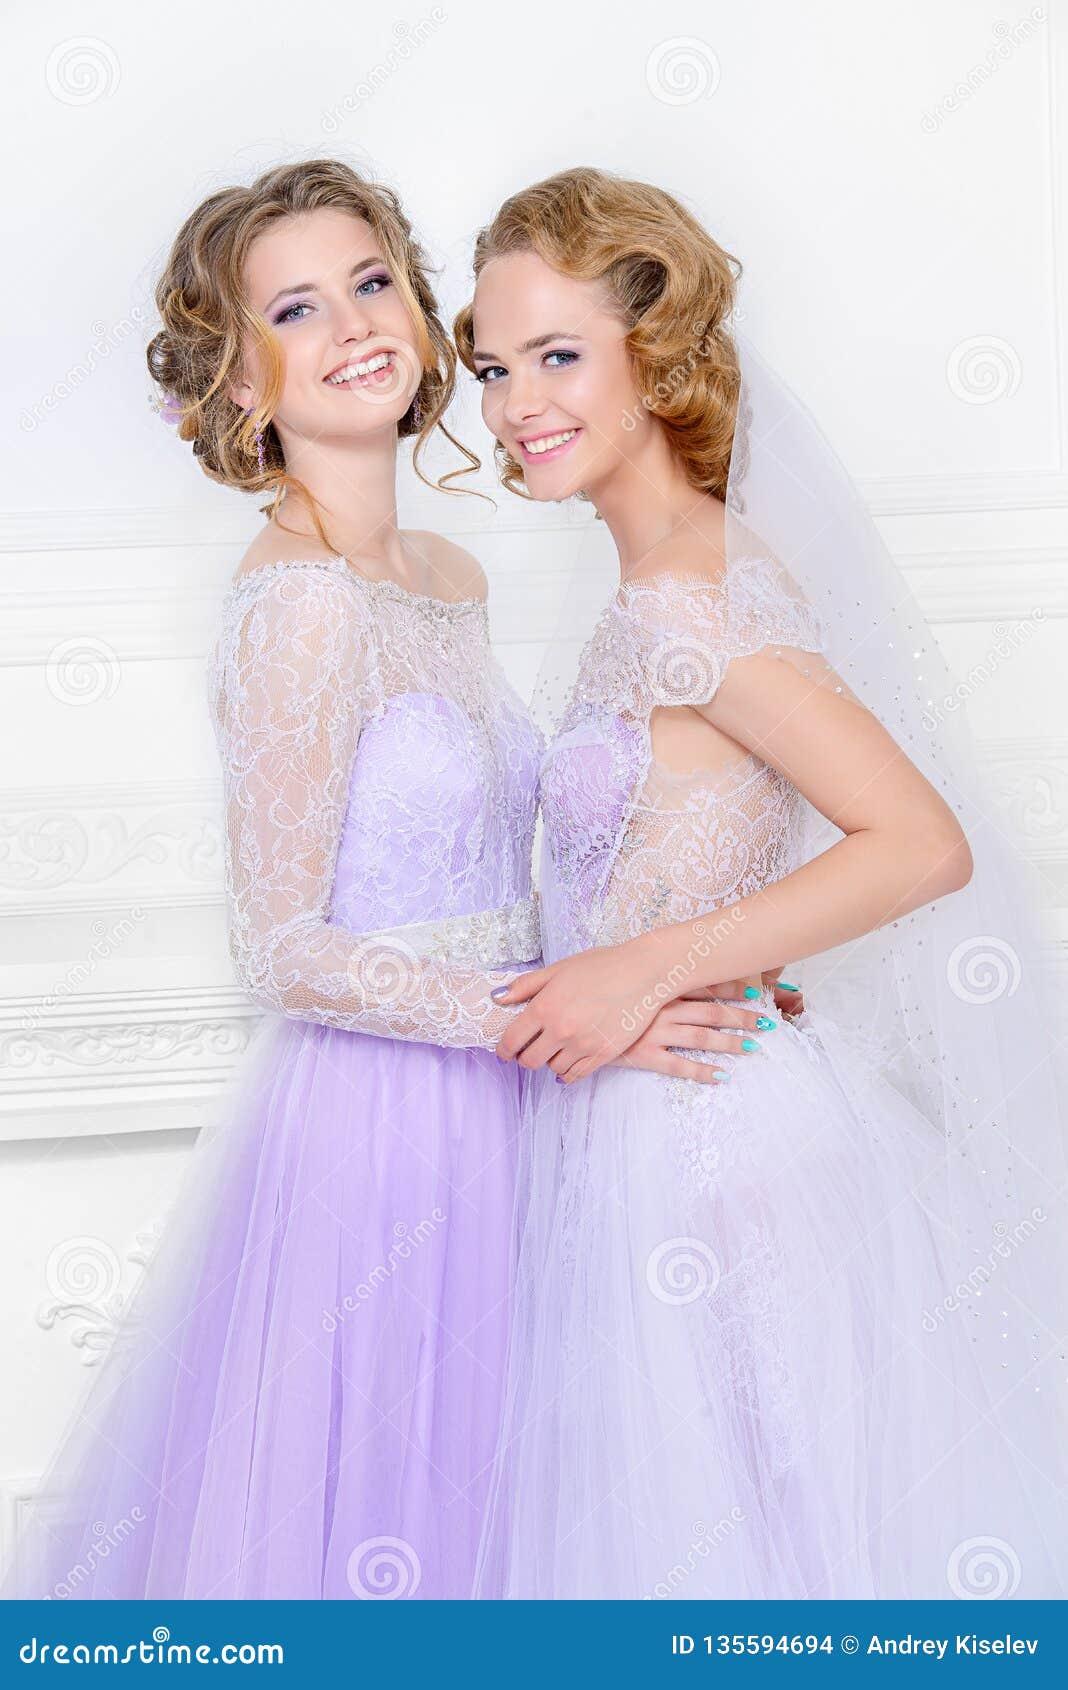 Girlfriends in wedding dresses